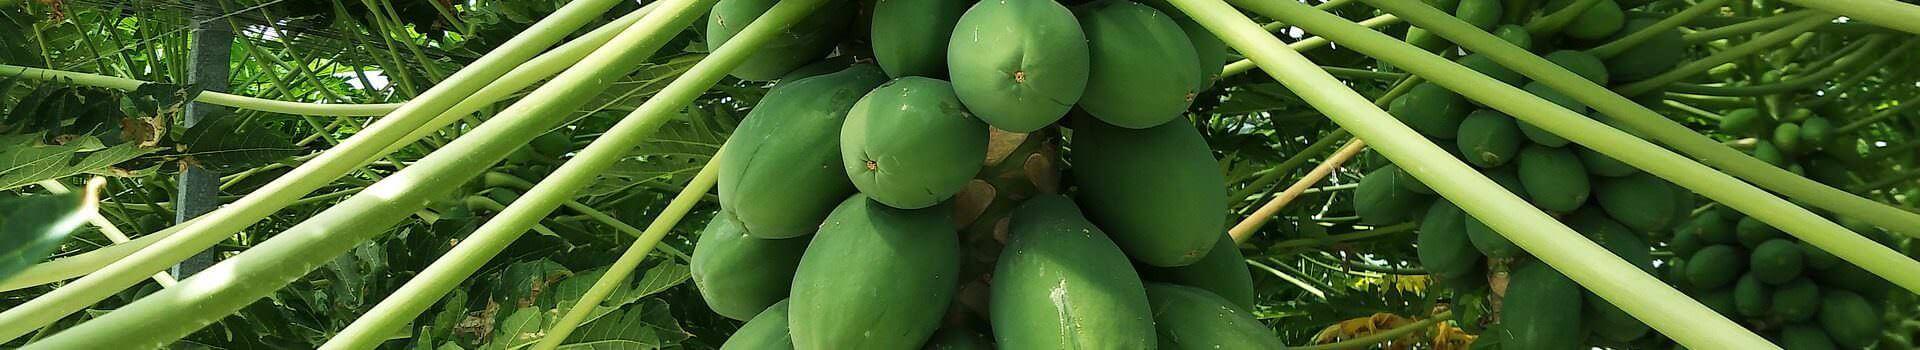 papaya-2922188_1920